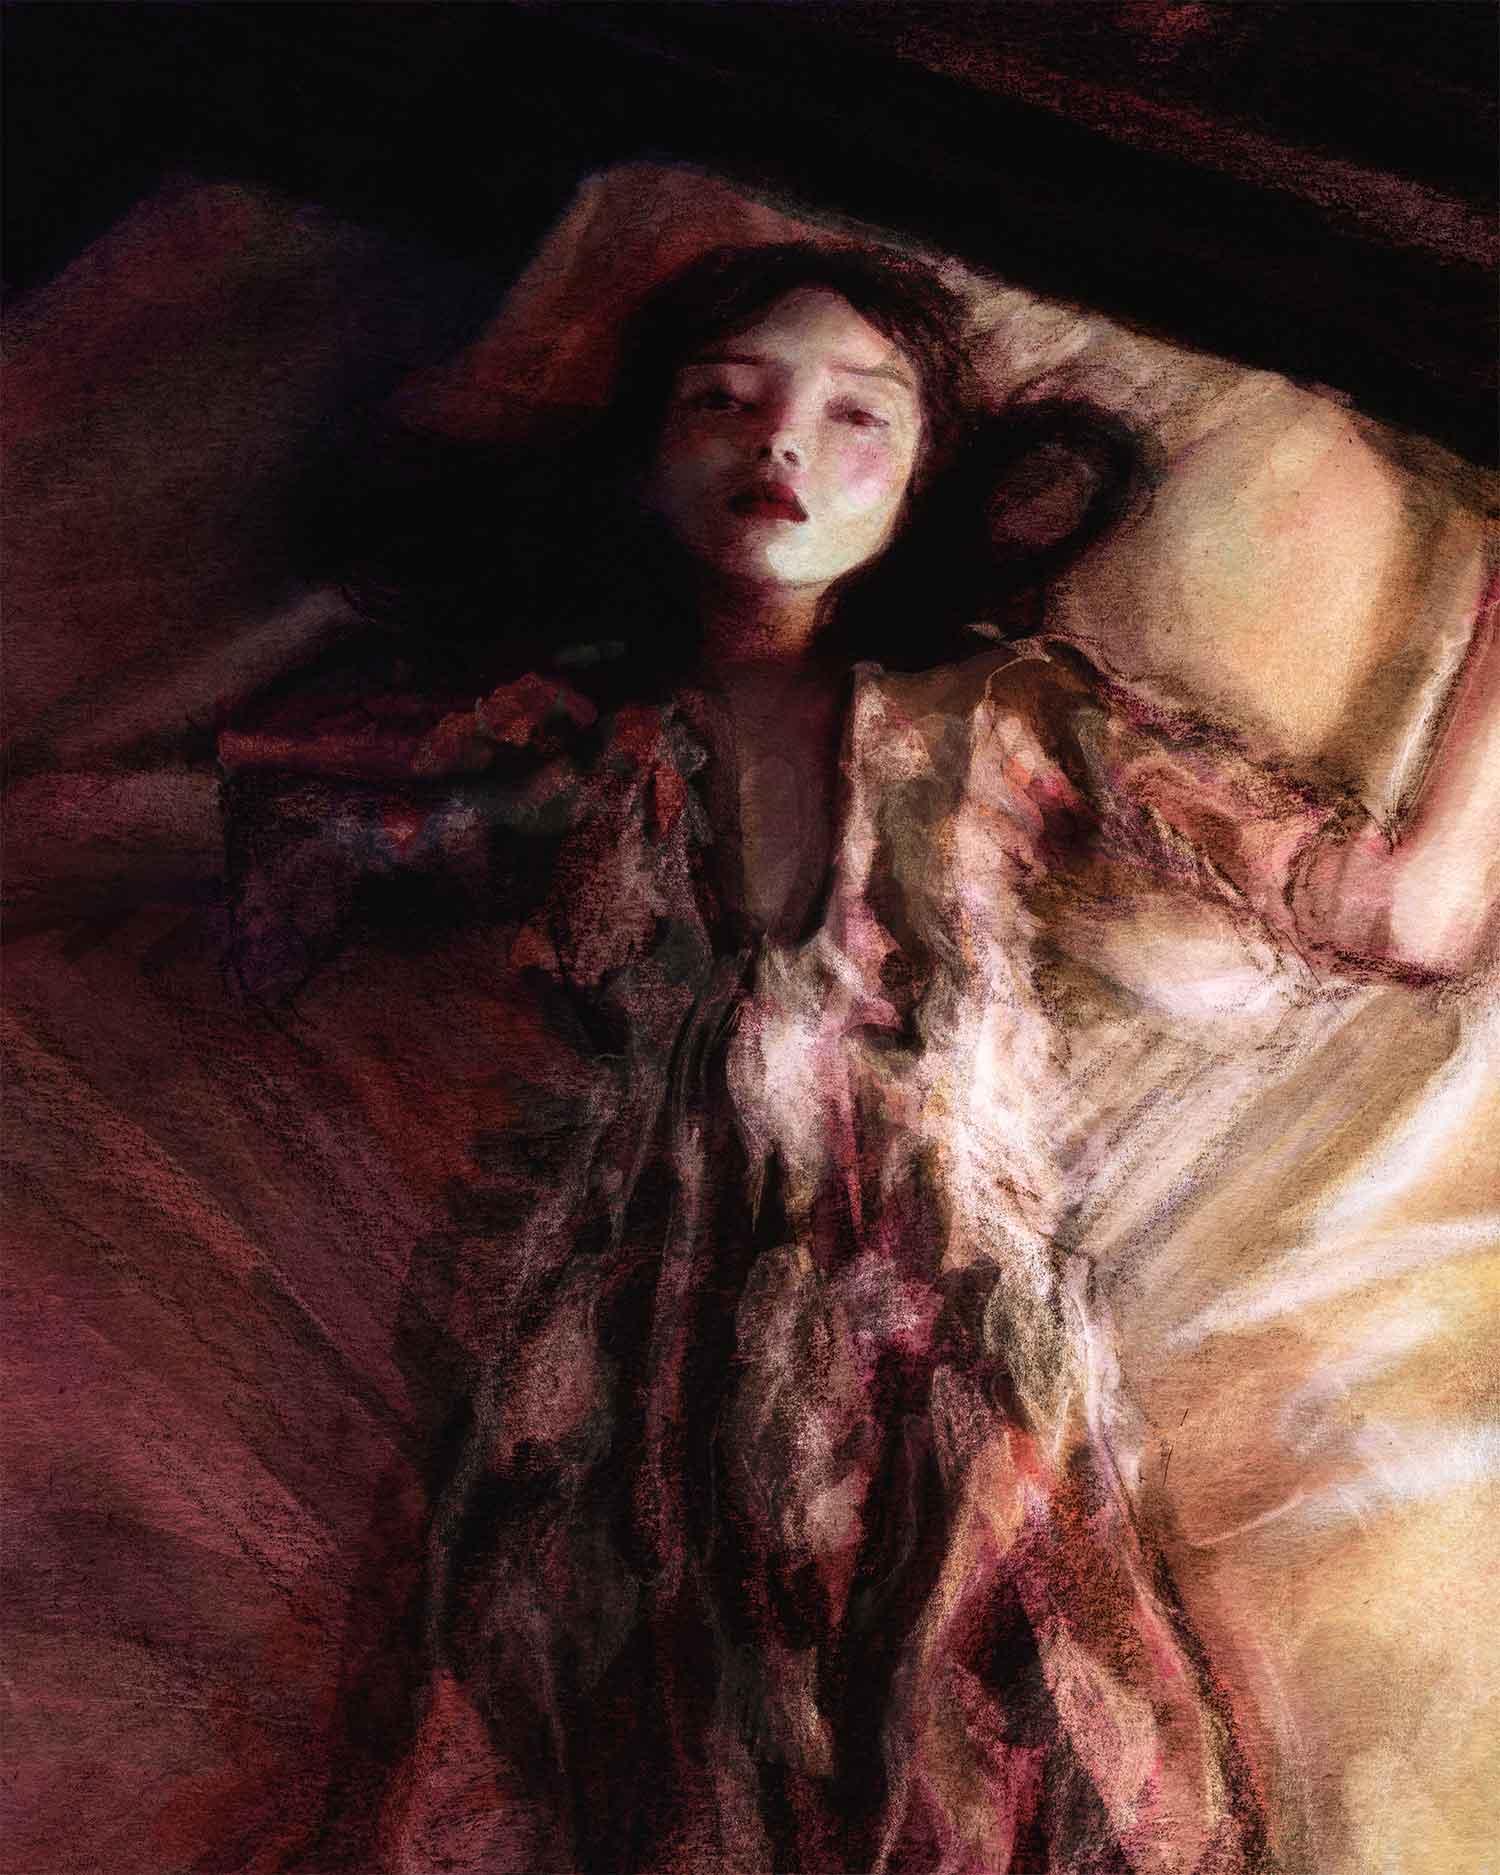 Artist Danny Roberts Fashion illustration of Japanese Fashion Brand malamute Fall 2020 winter Collection